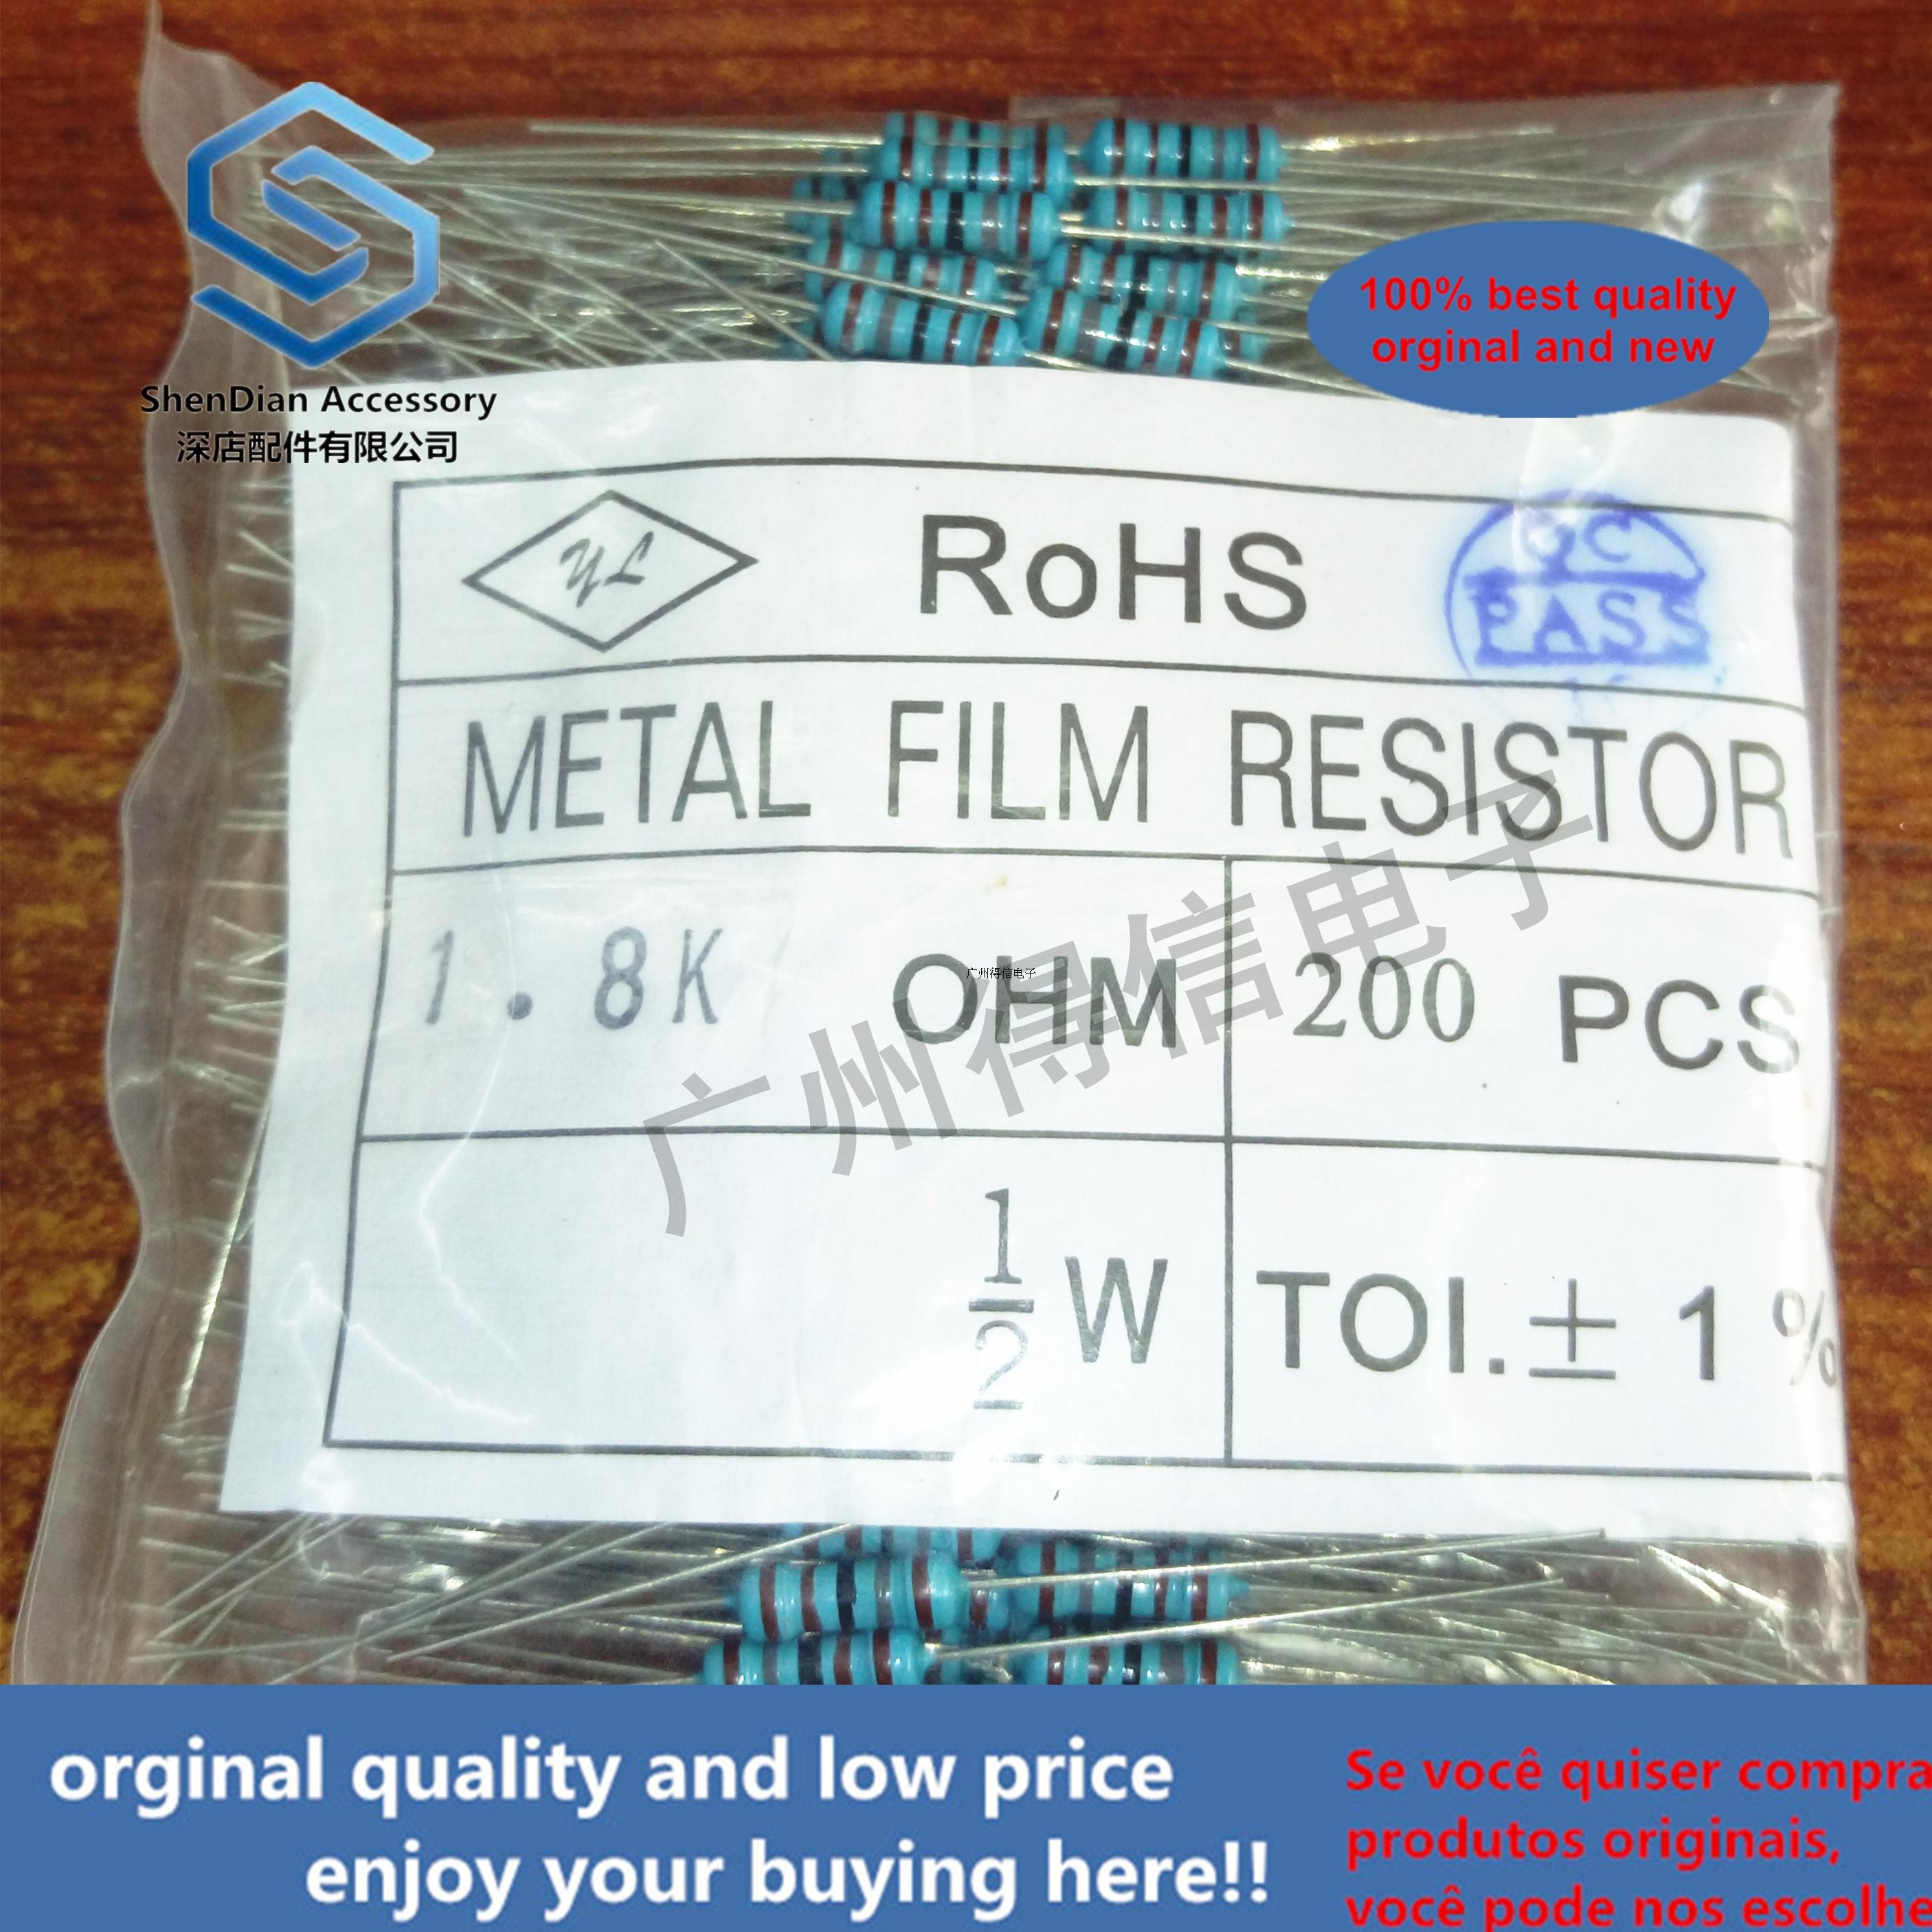 200pcs 1 / 2W 910K 1% Brand New Metal Film Iron Feet Resistance Bag 200 Pcs Per Pack